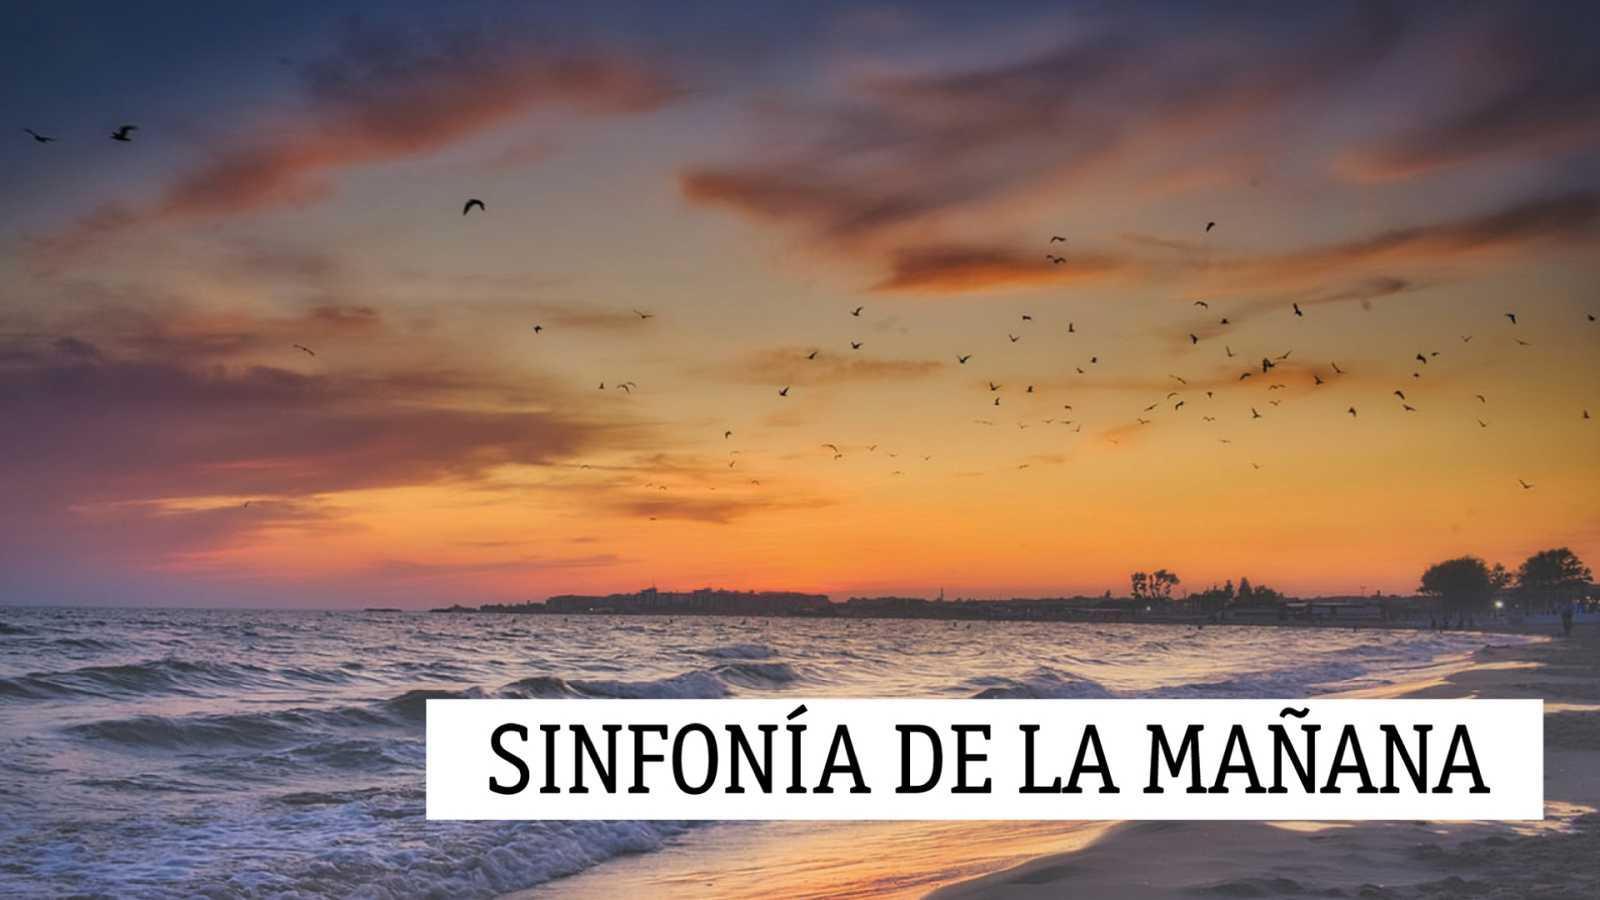 Sinfonía de la mañana - Eduard Tubin - 03/05/21 - escuchar ahora